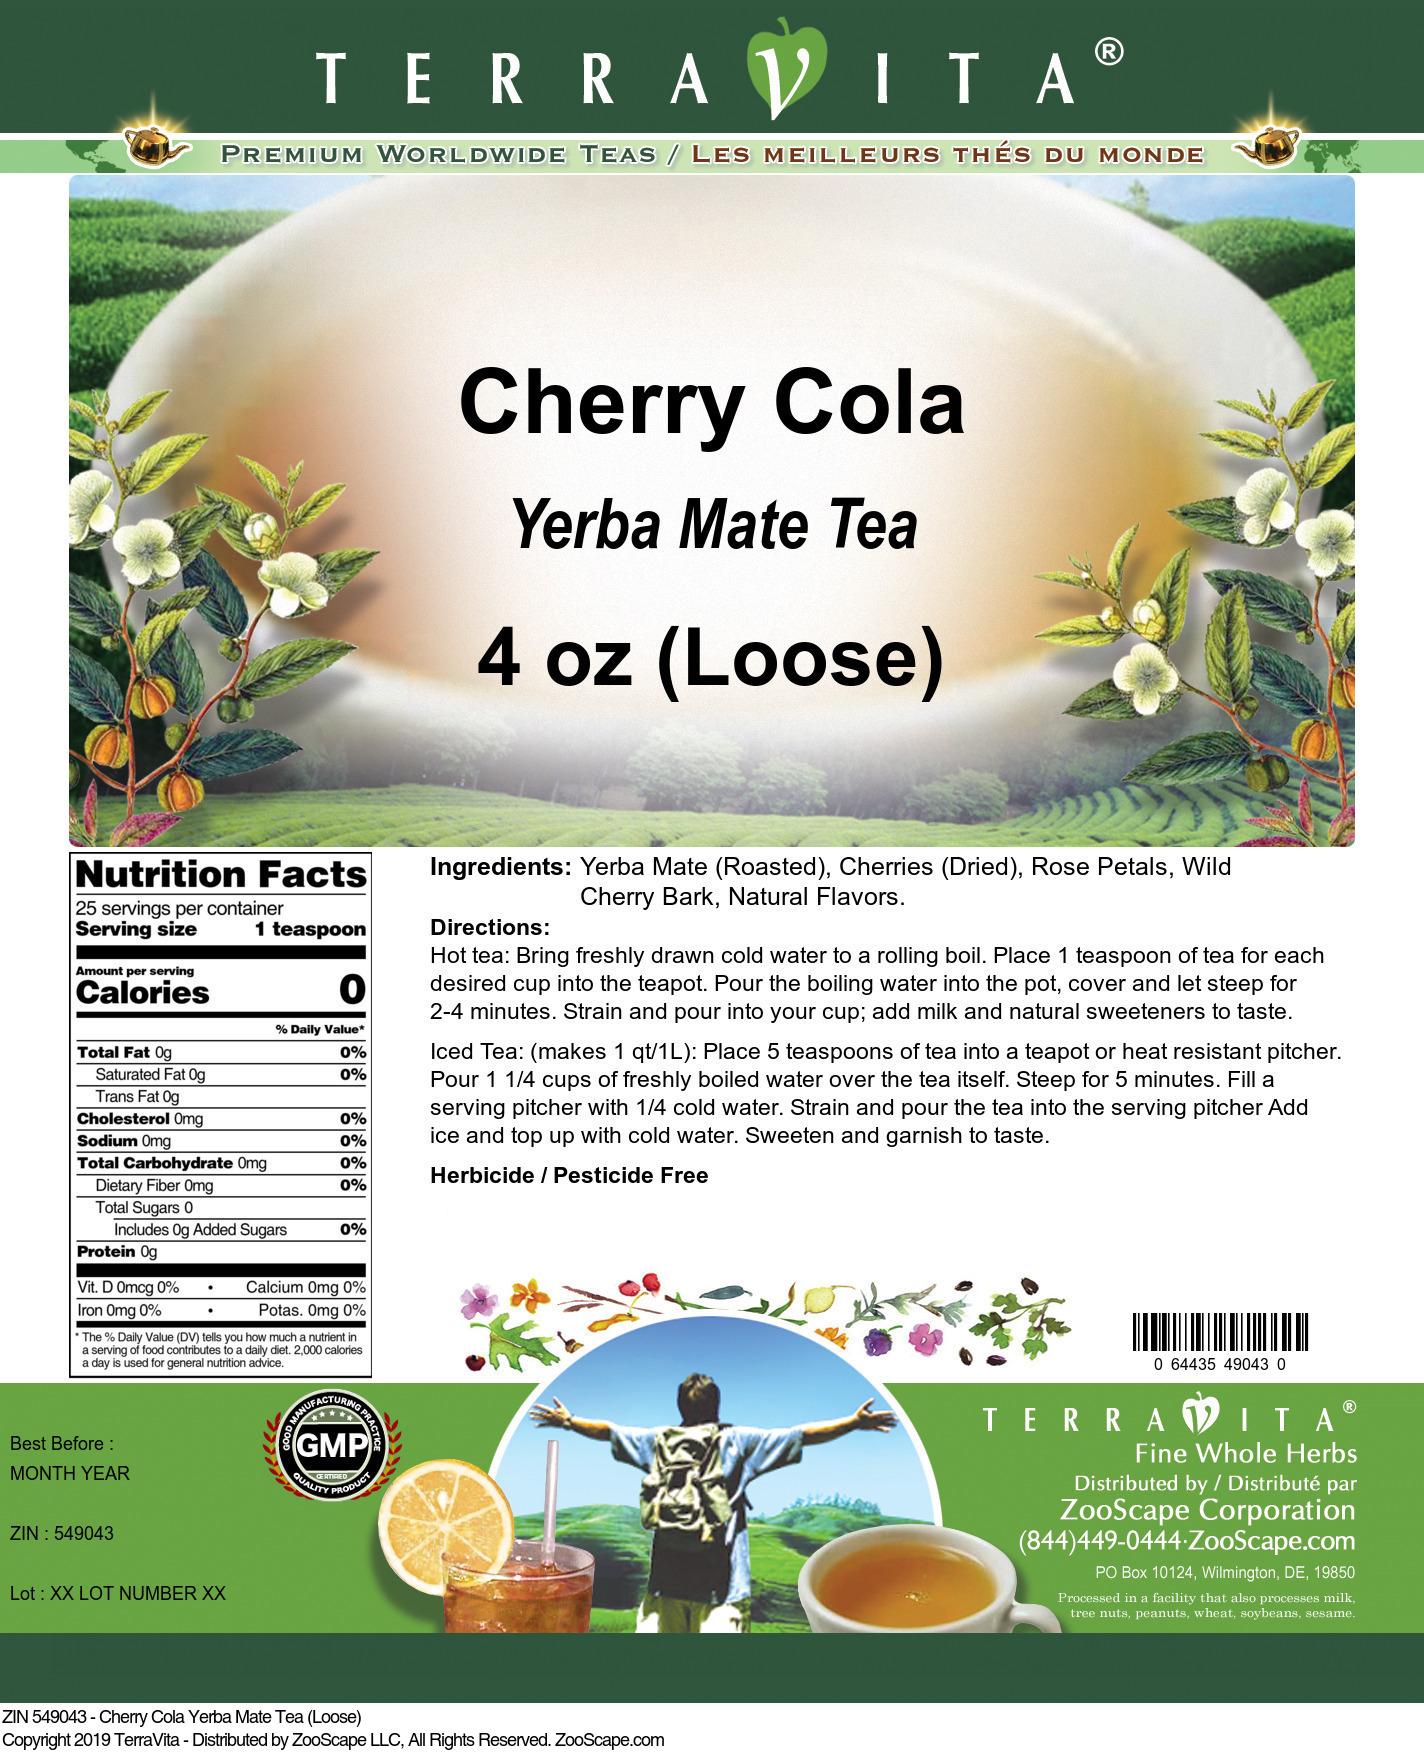 Cherry Cola Yerba Mate Tea (Loose)